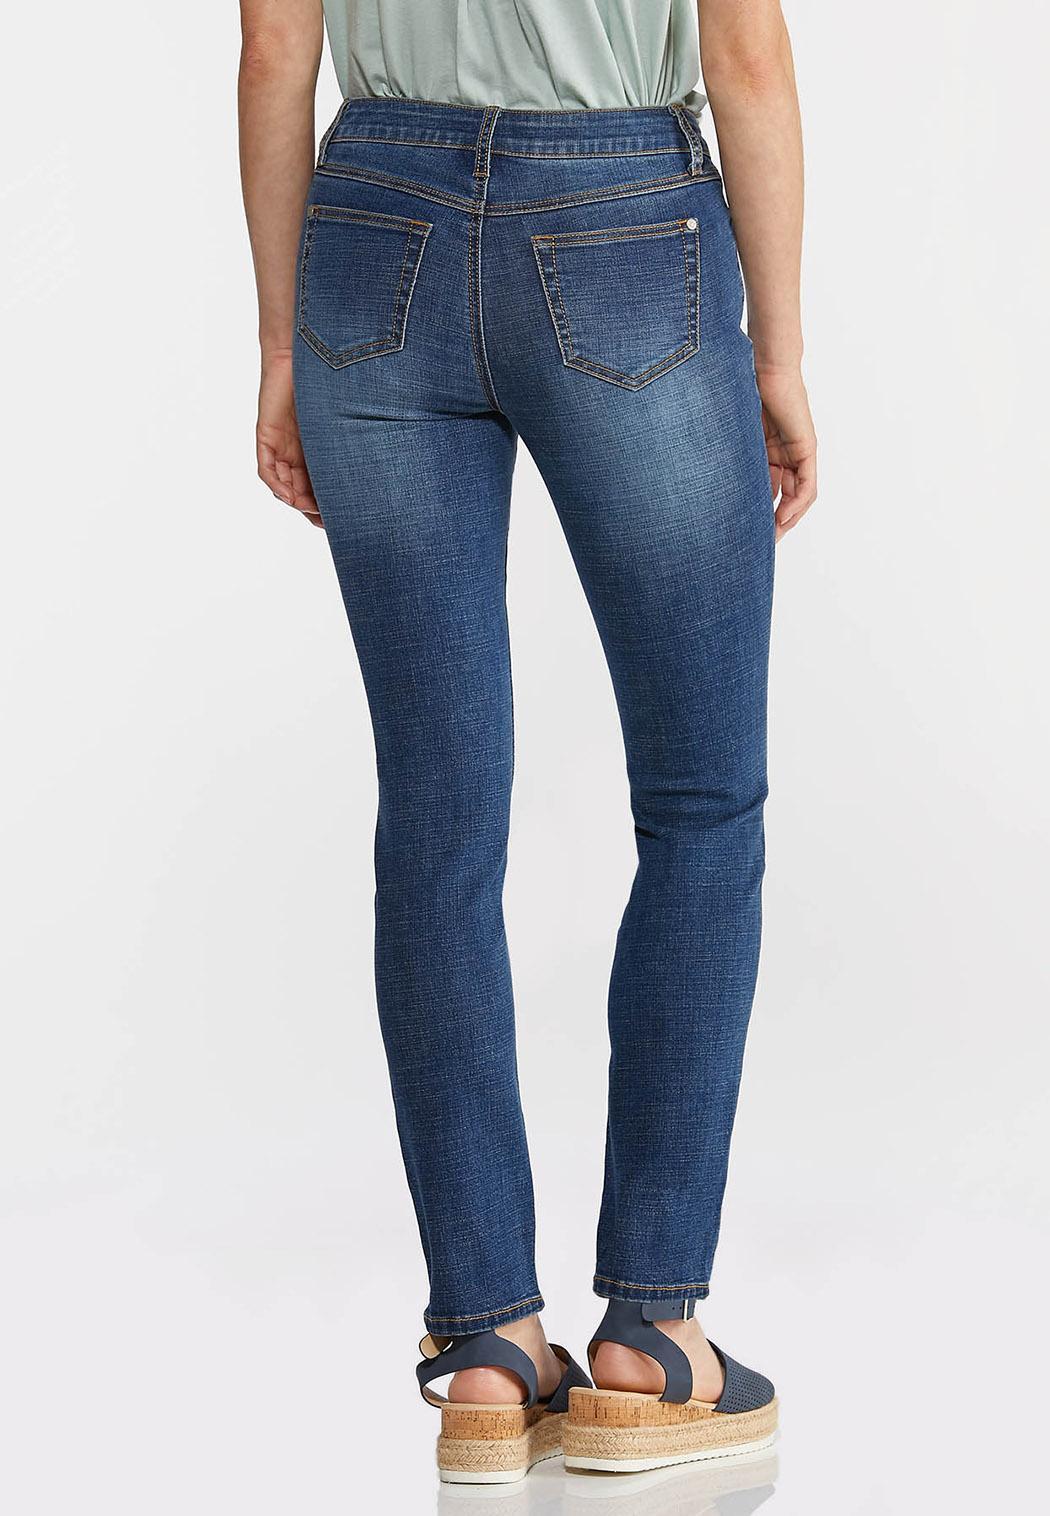 Mid-Rise Skinny Jeans (Item #44332105)